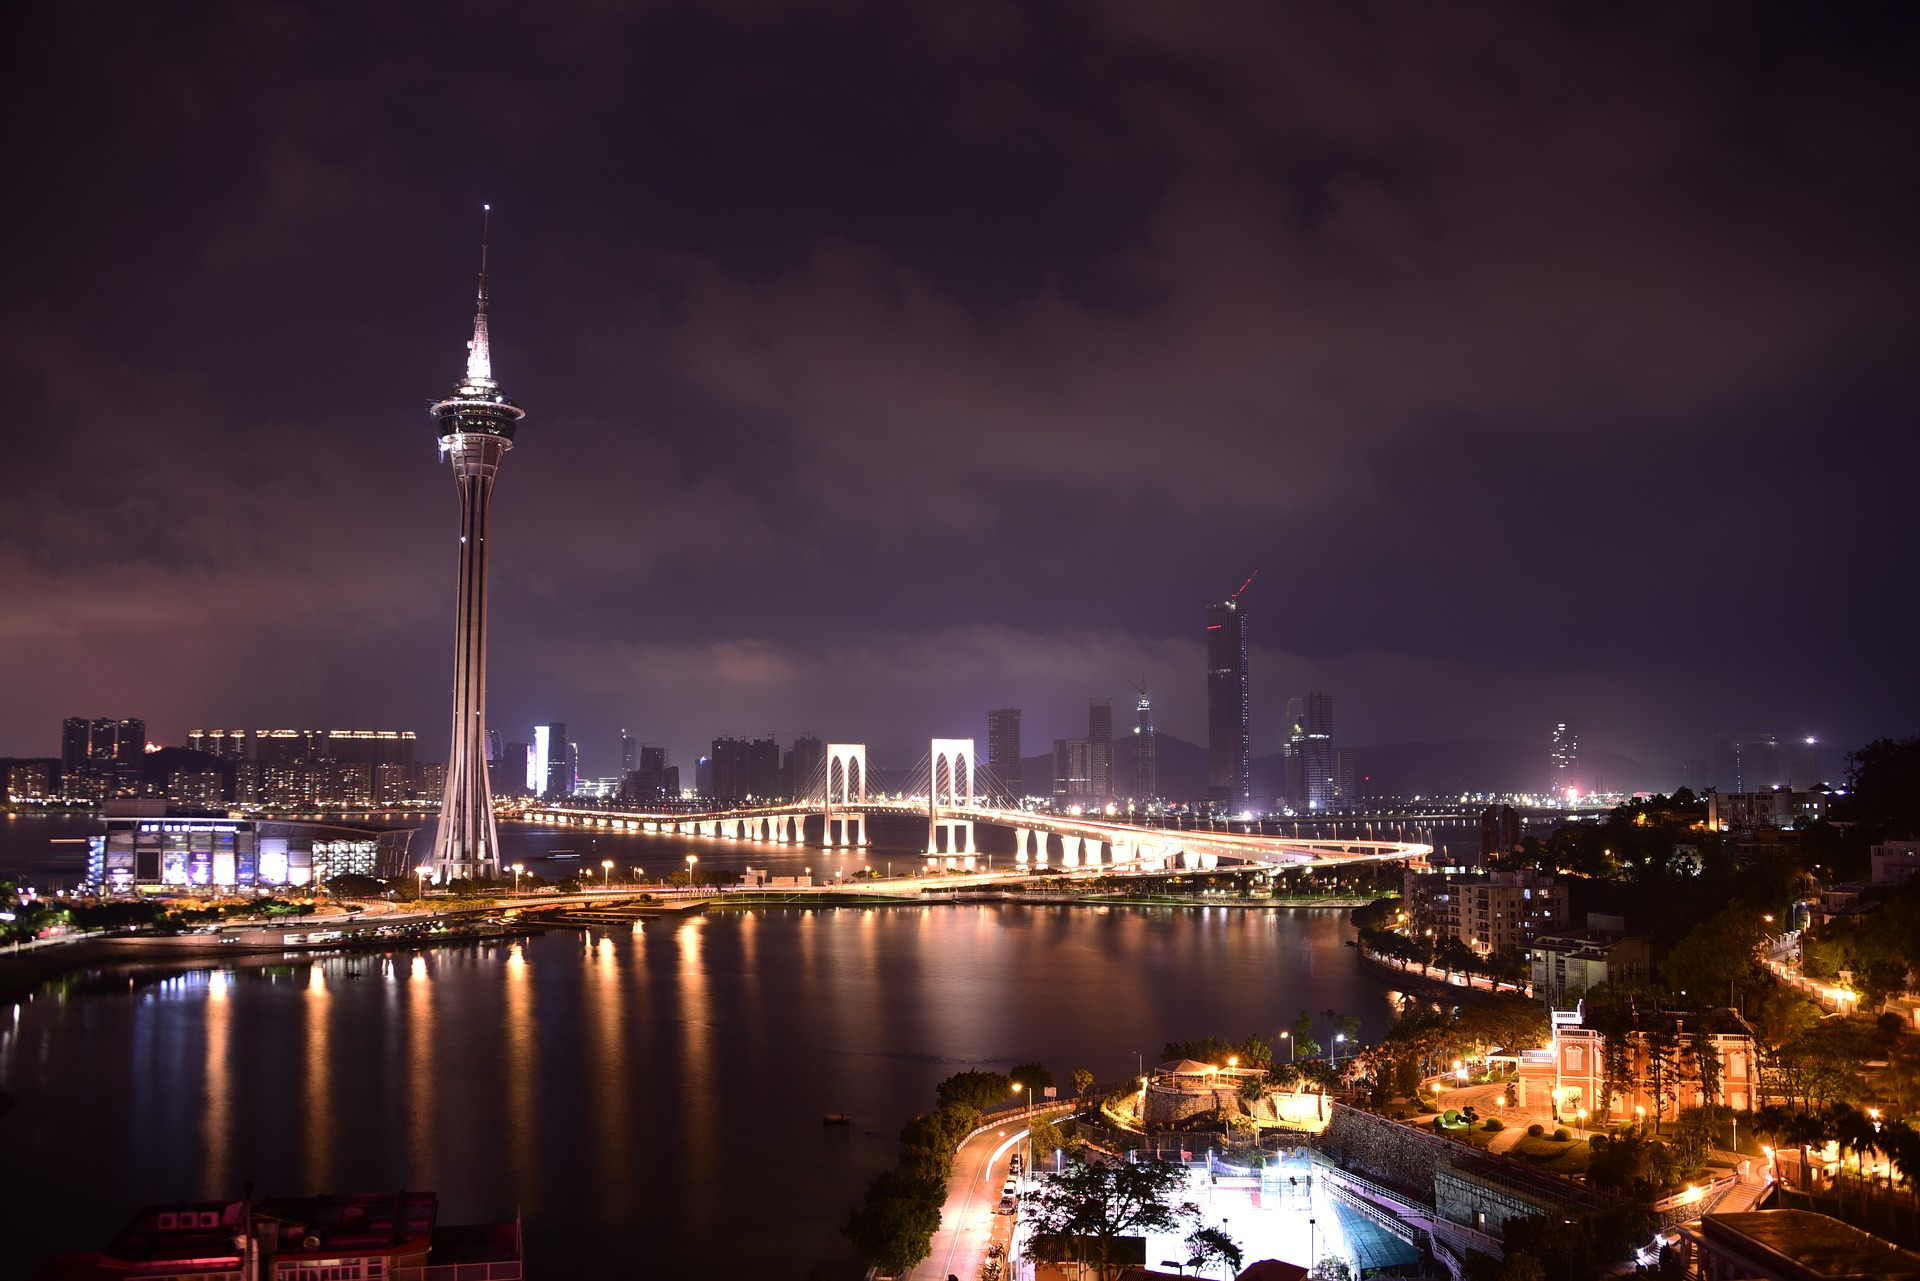 Macau airport to city center, Macau airport to city, How To Get From Macau Airport To City Center